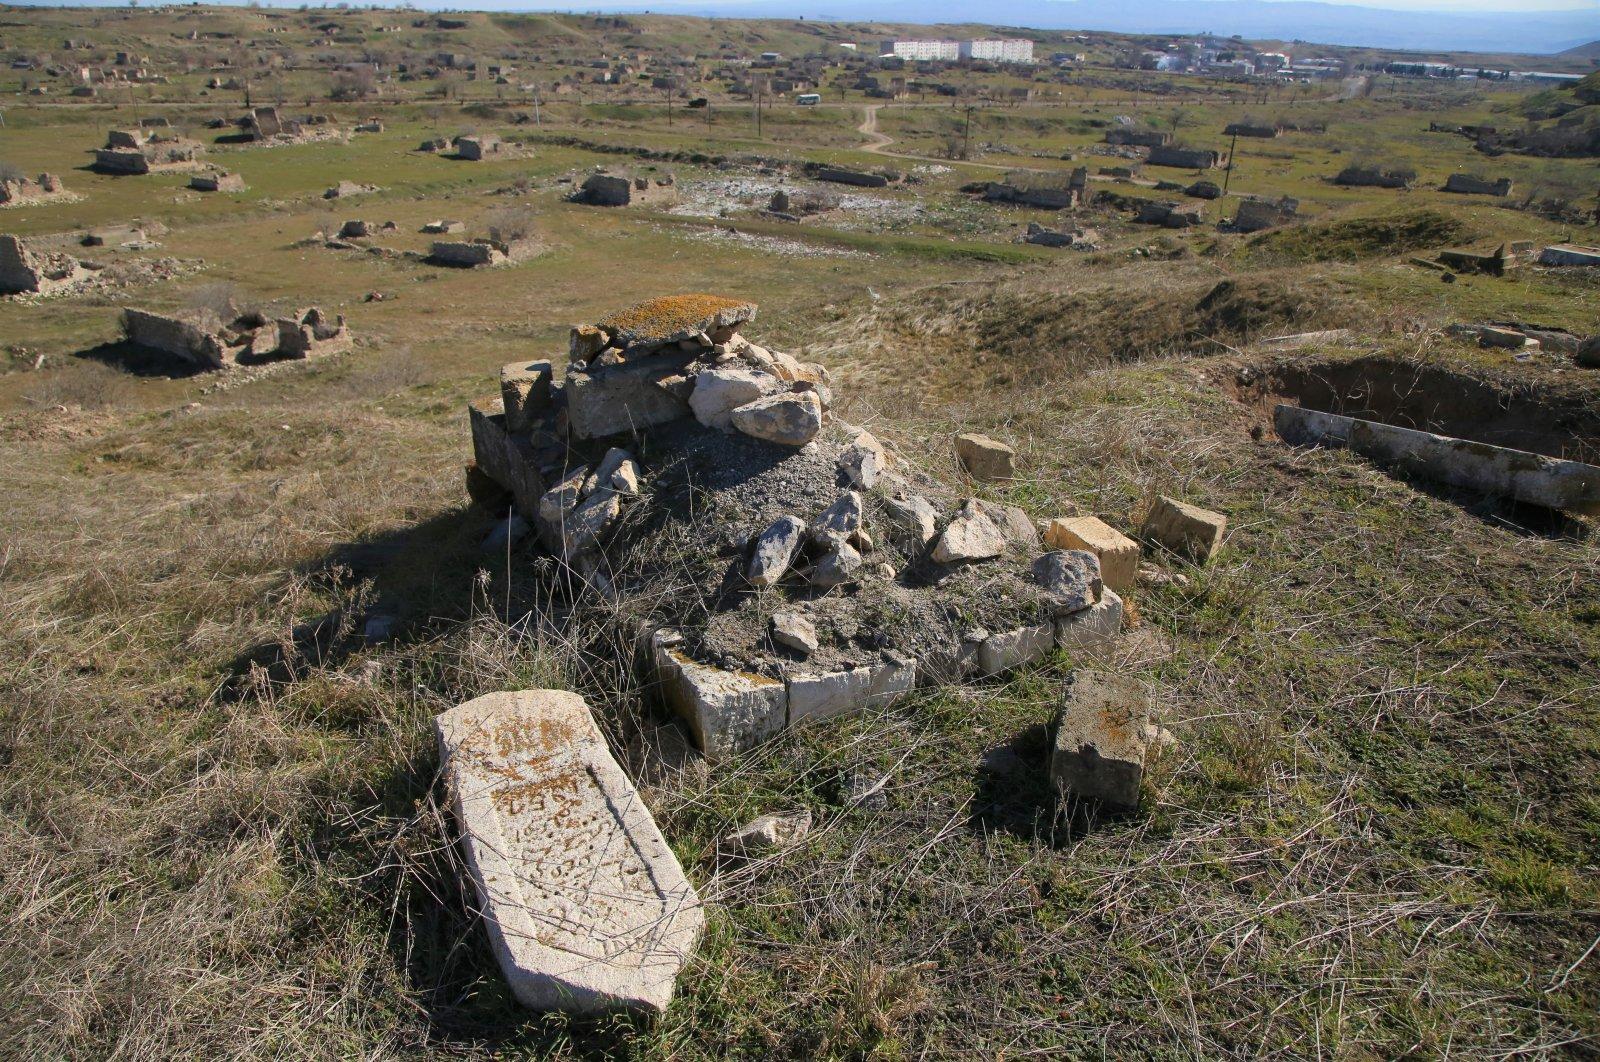 Armenian damage in Nagorno-Karabakh reveals itself in cemeteries